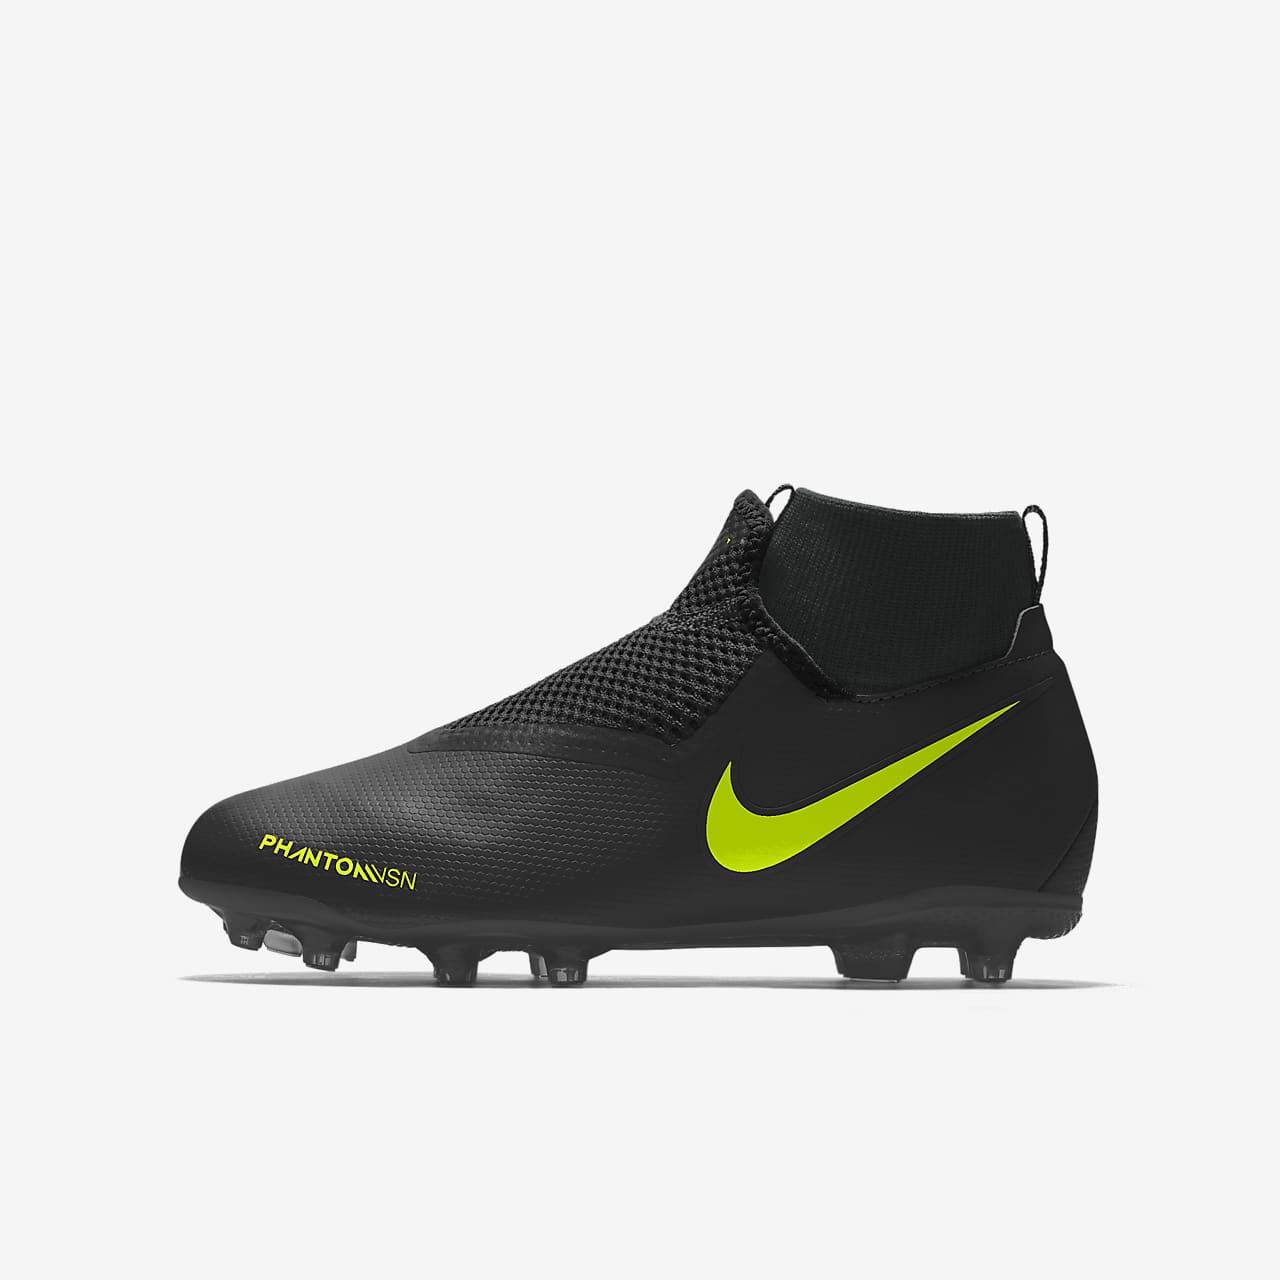 Nike Phantom Vision Academy Jr. MG By You Custom Older Kids' Multi-Ground Football Boot